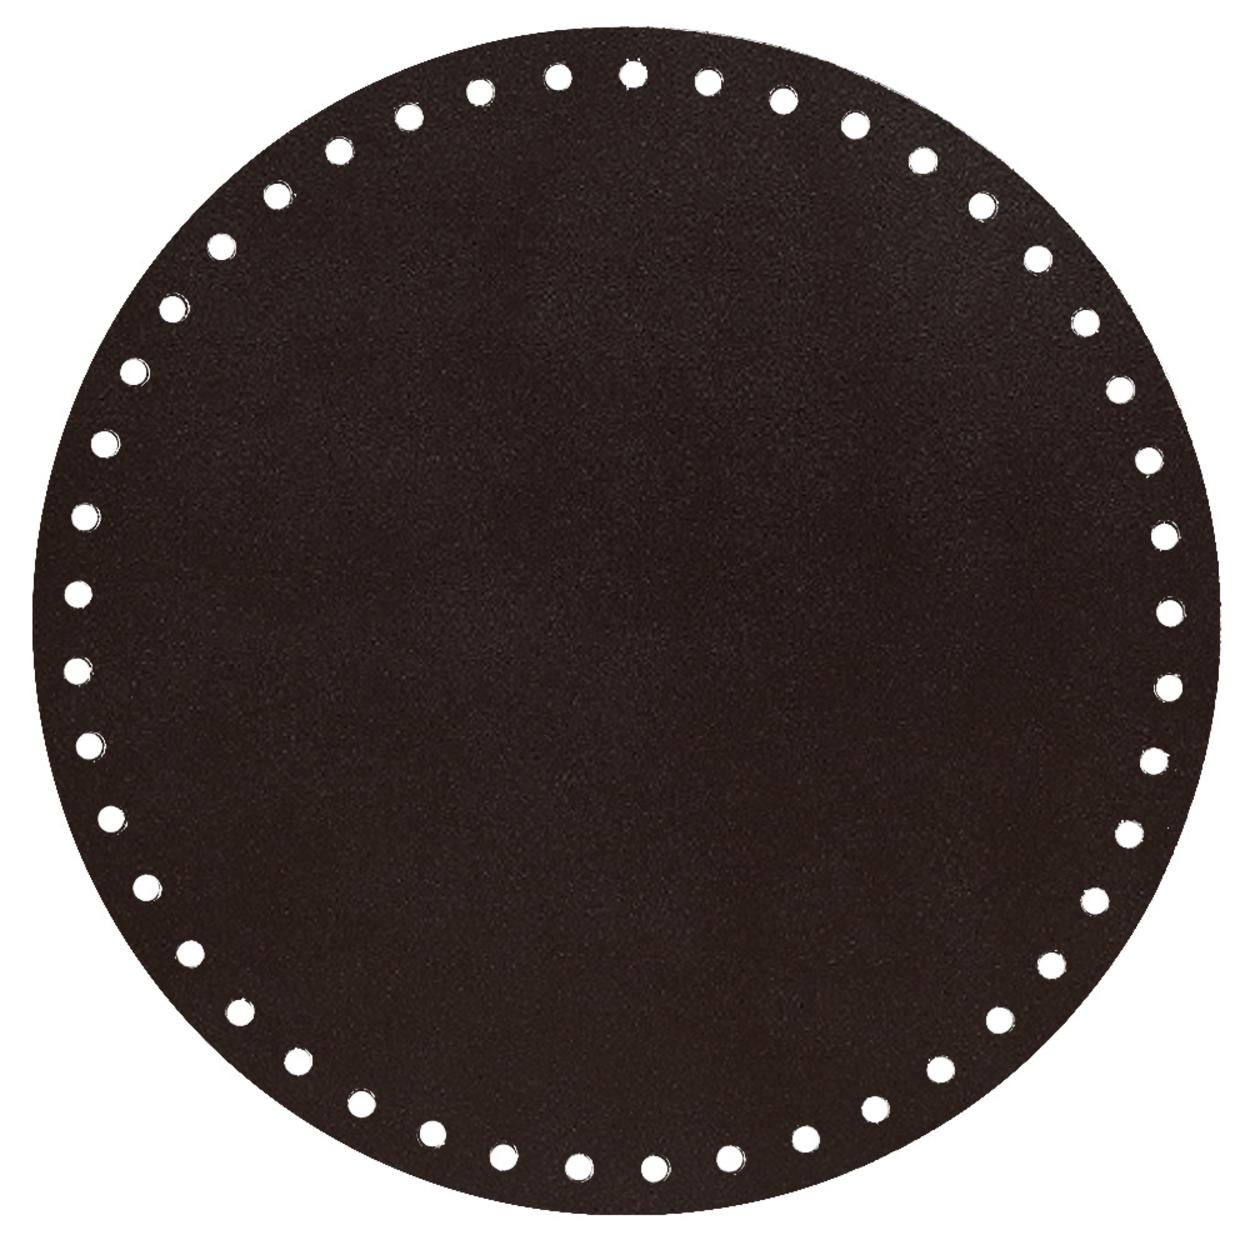 Кожа - Дно для сумки круглое 20 см. Горький шоколад